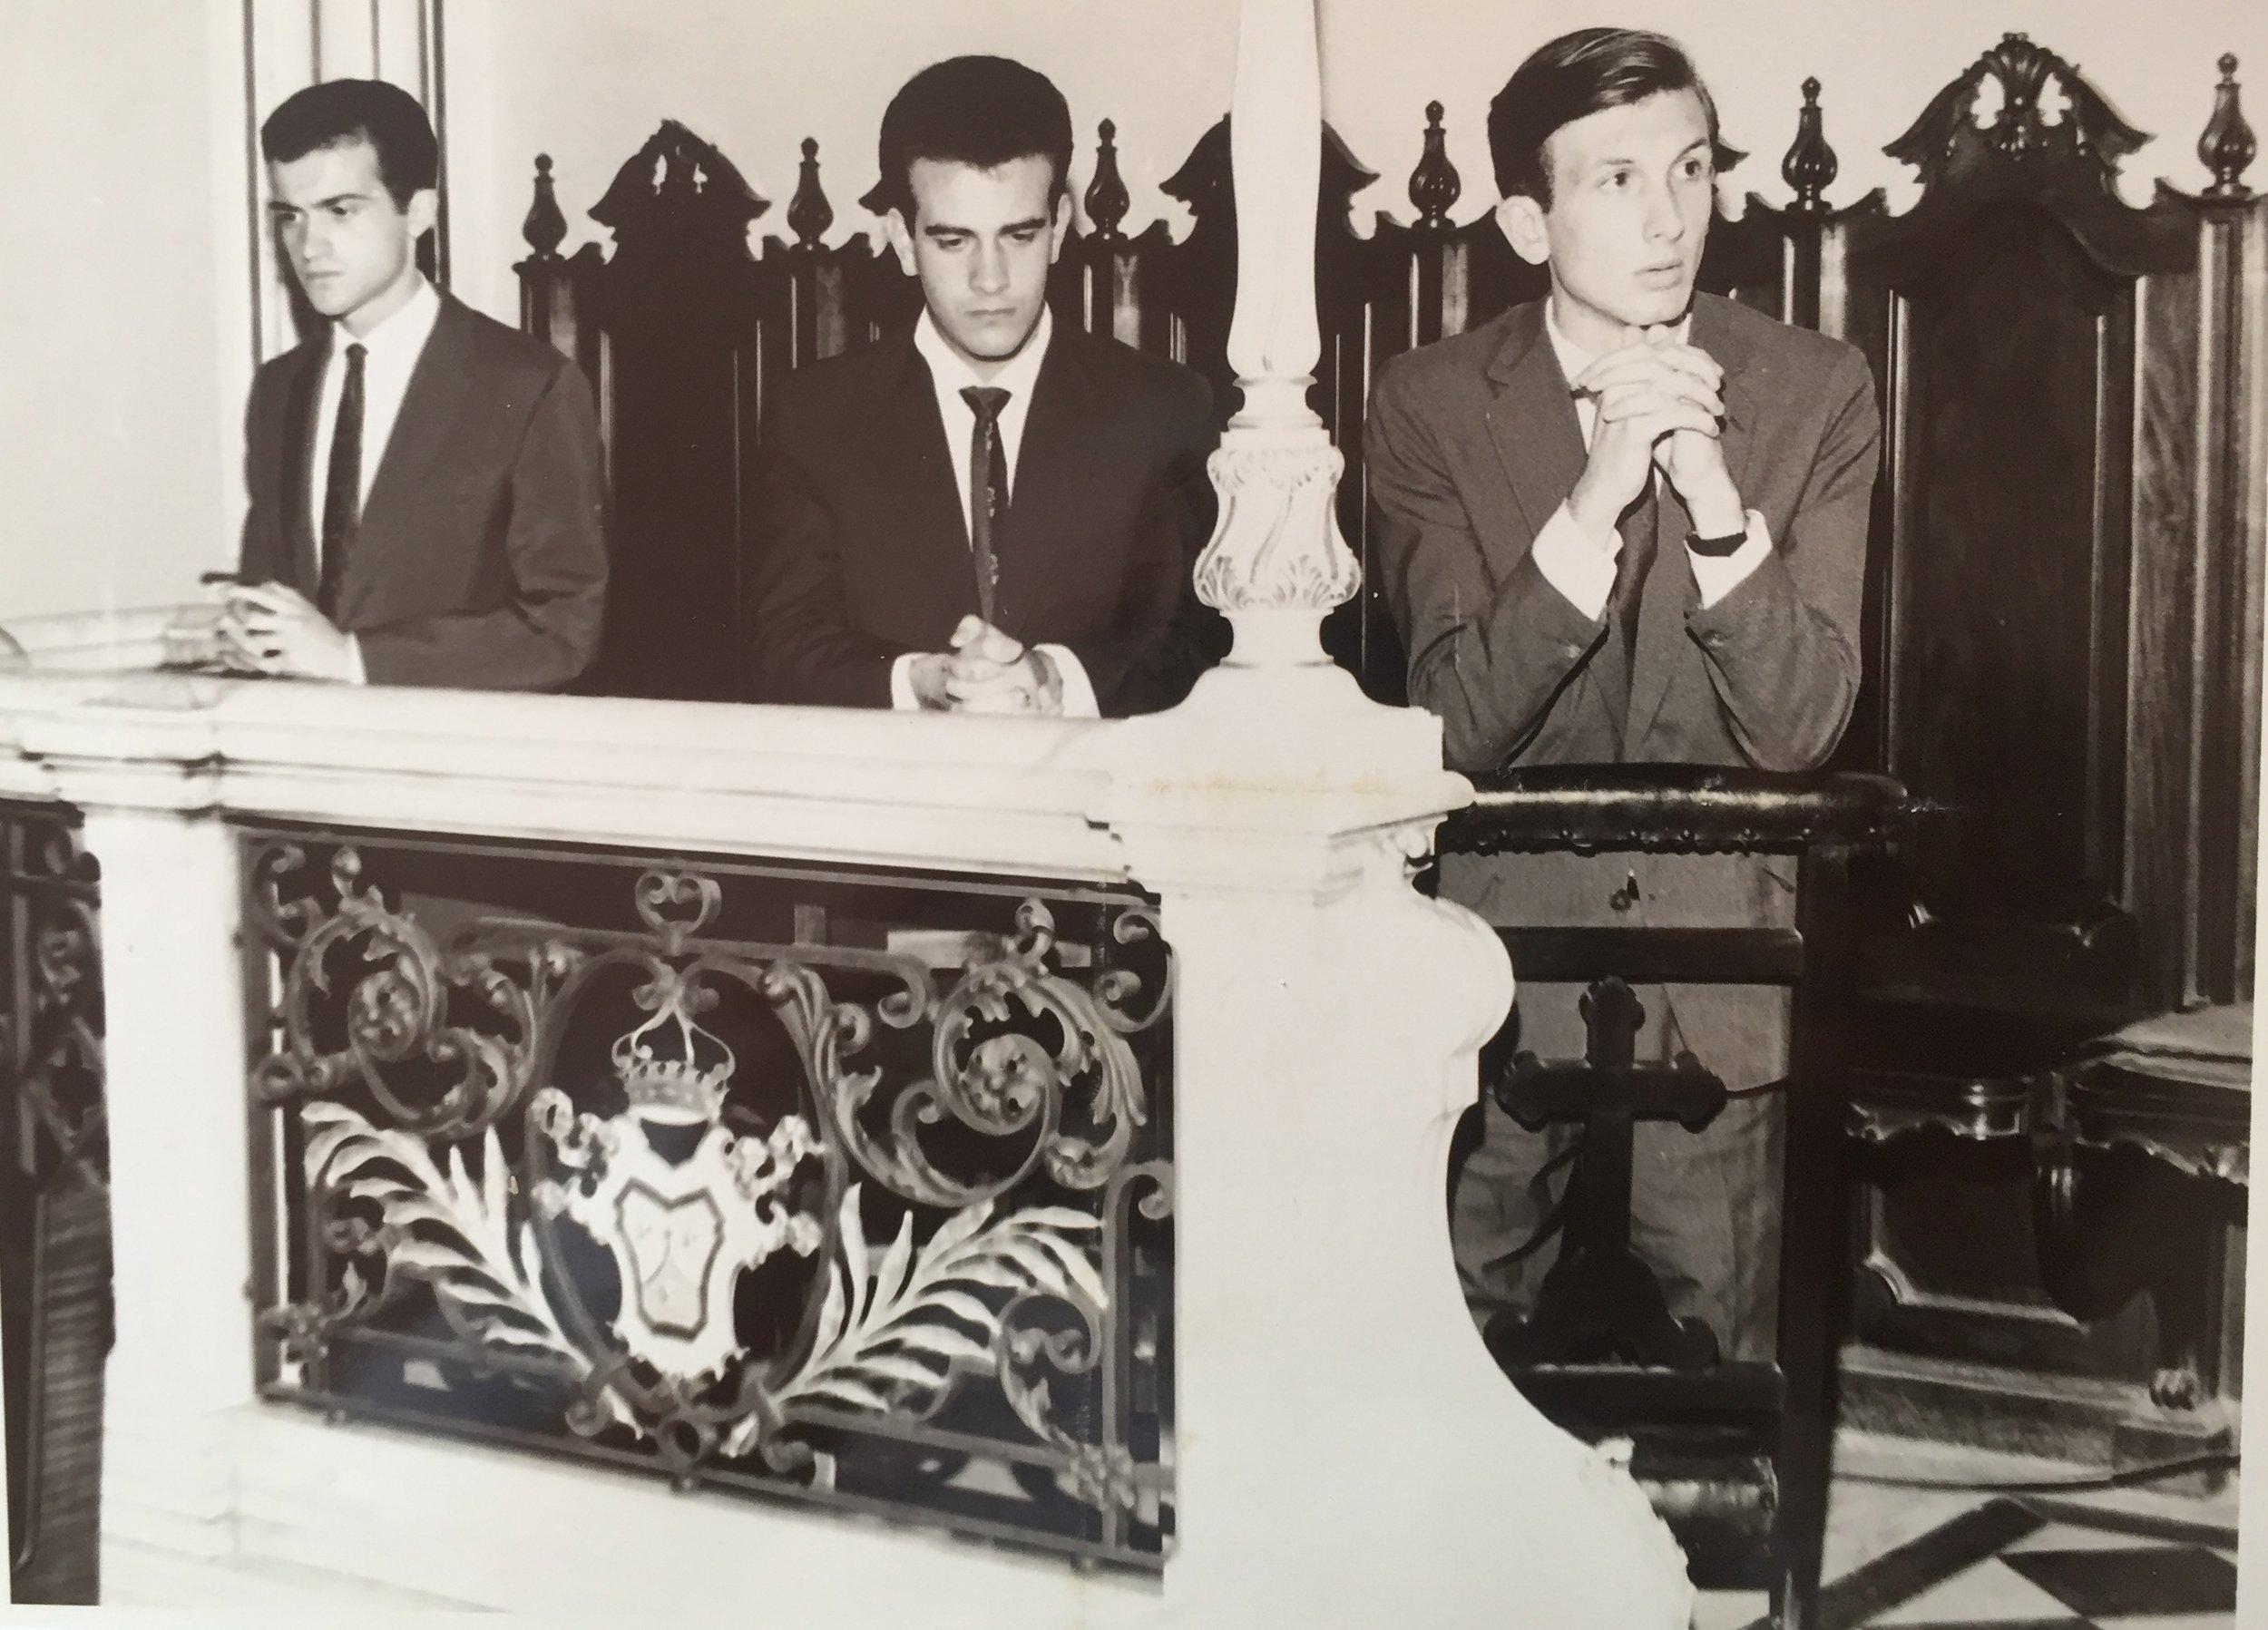 CARMo - Missa formatura cientifico 1963.jpg